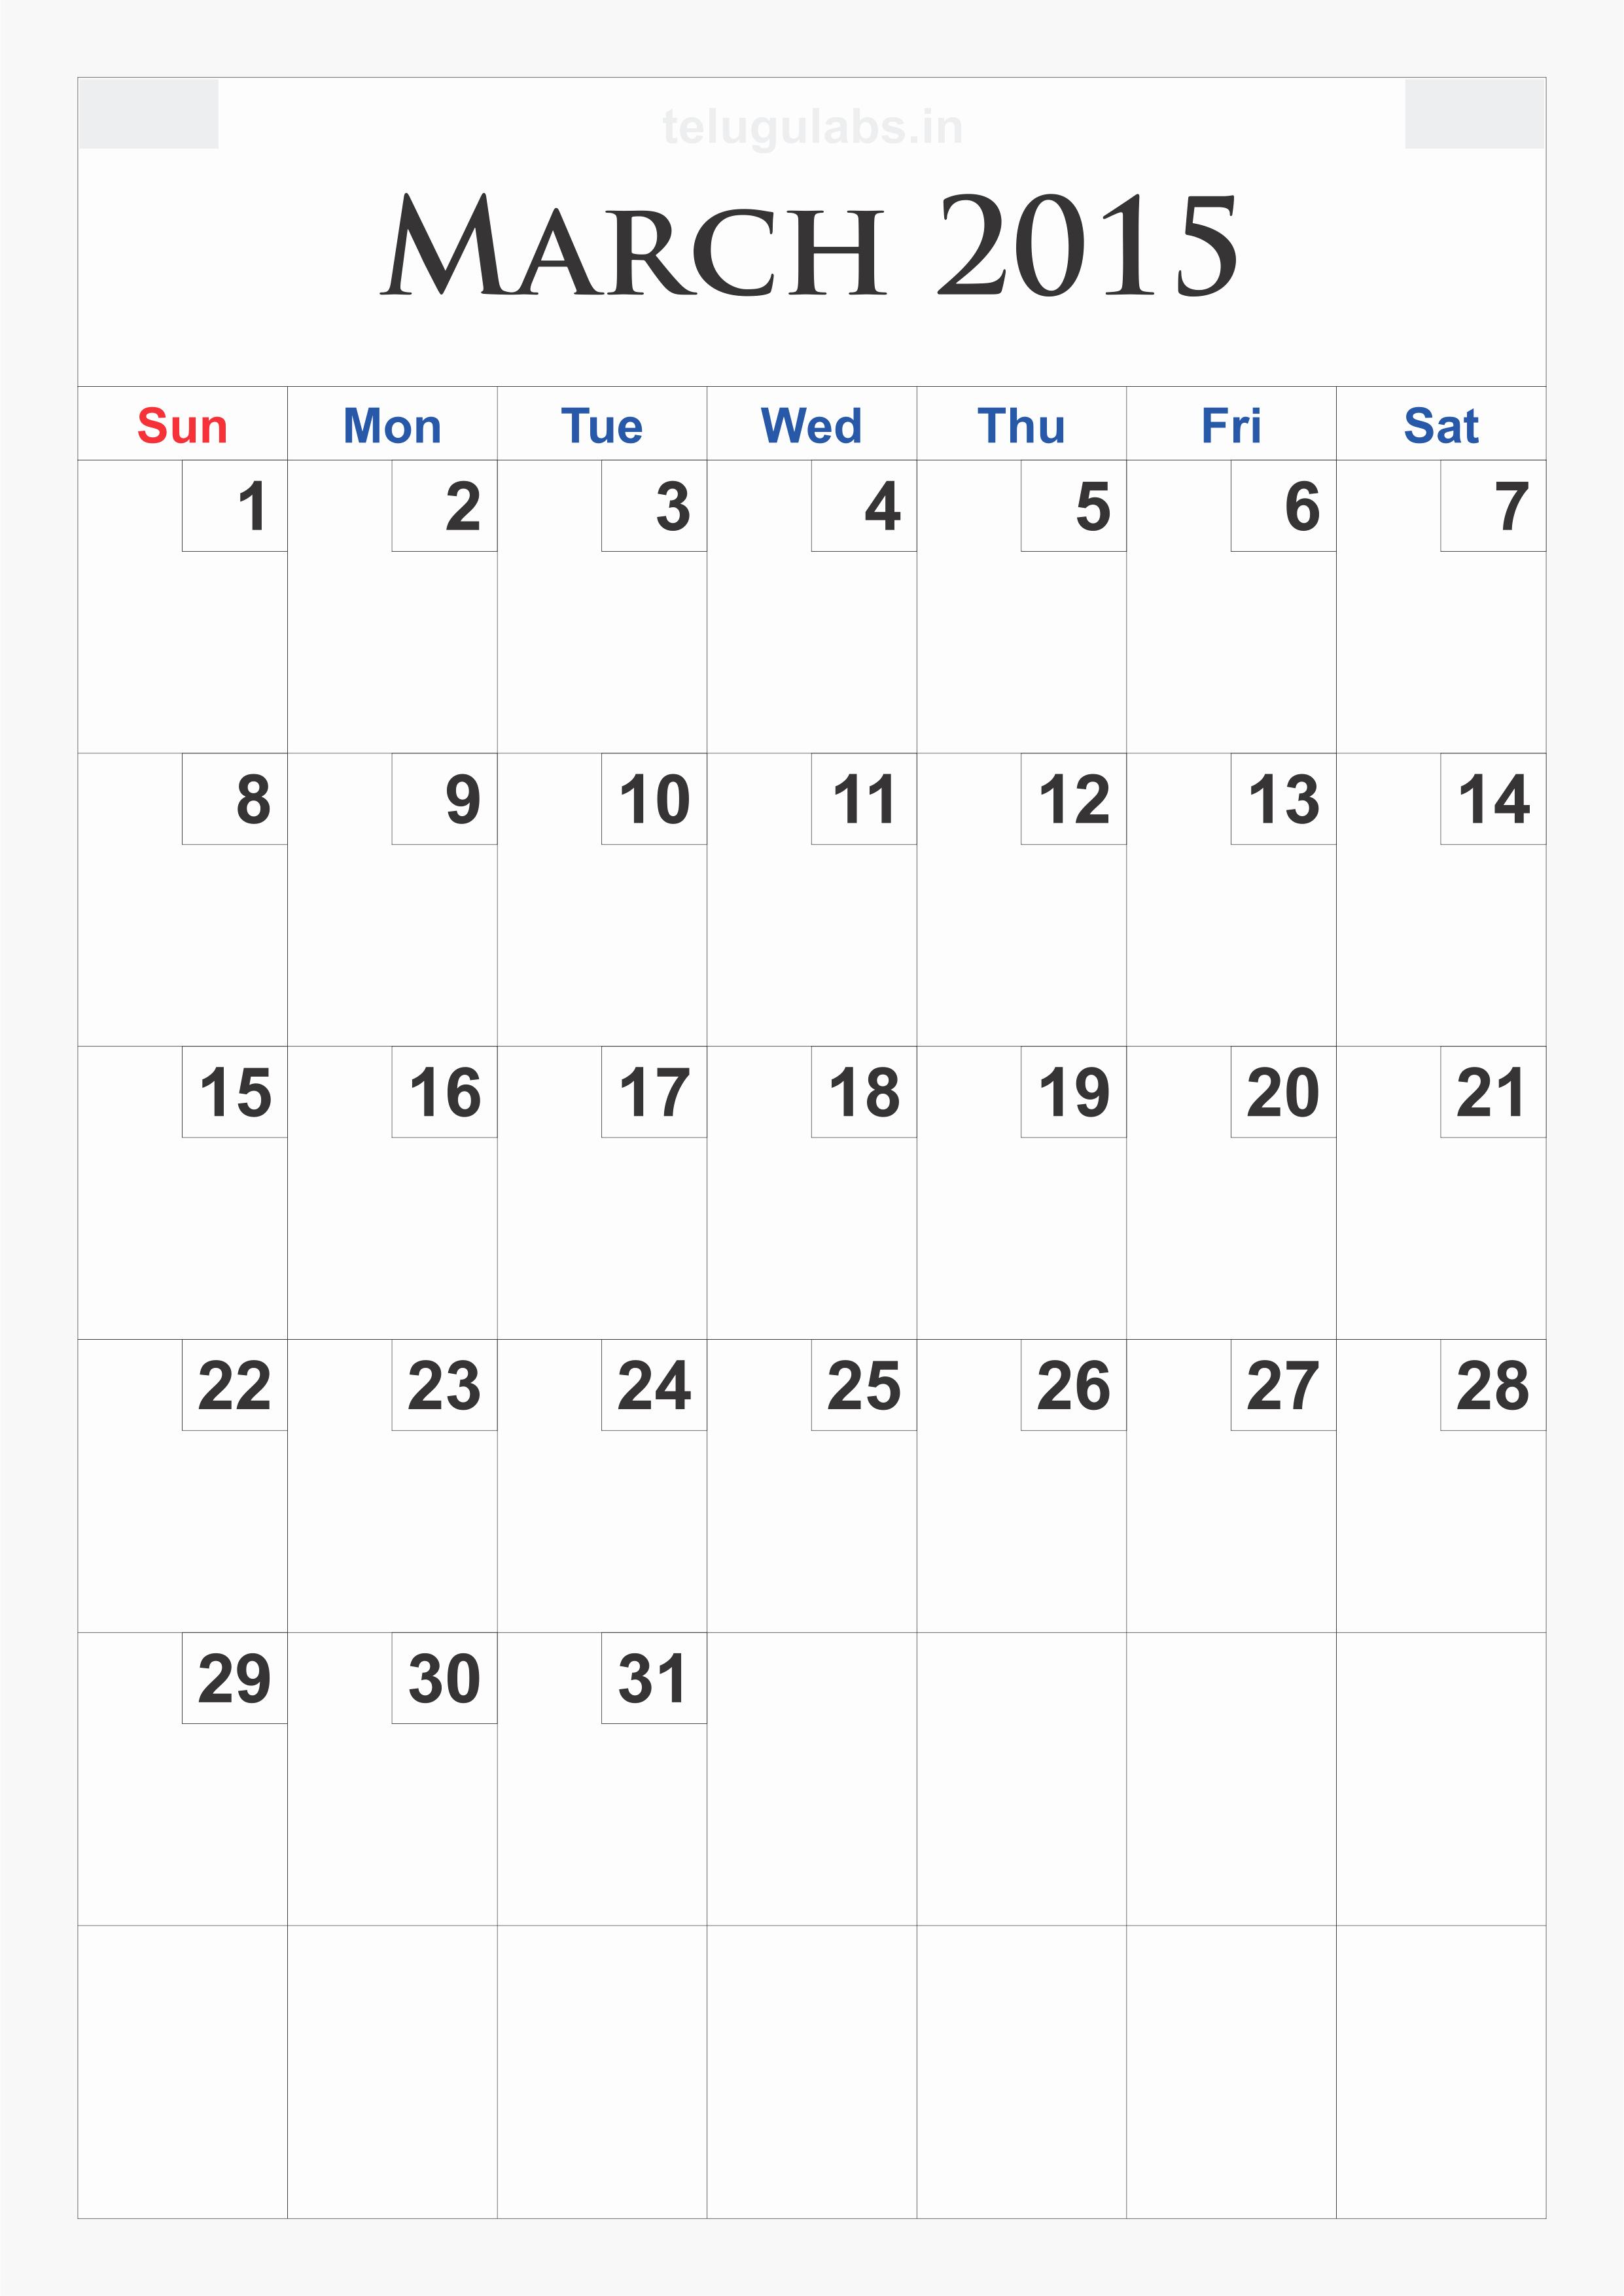 Printable 3 Month Calendar 2015 Lovely 9 Best Of March 2015 Printable Calendar organizer